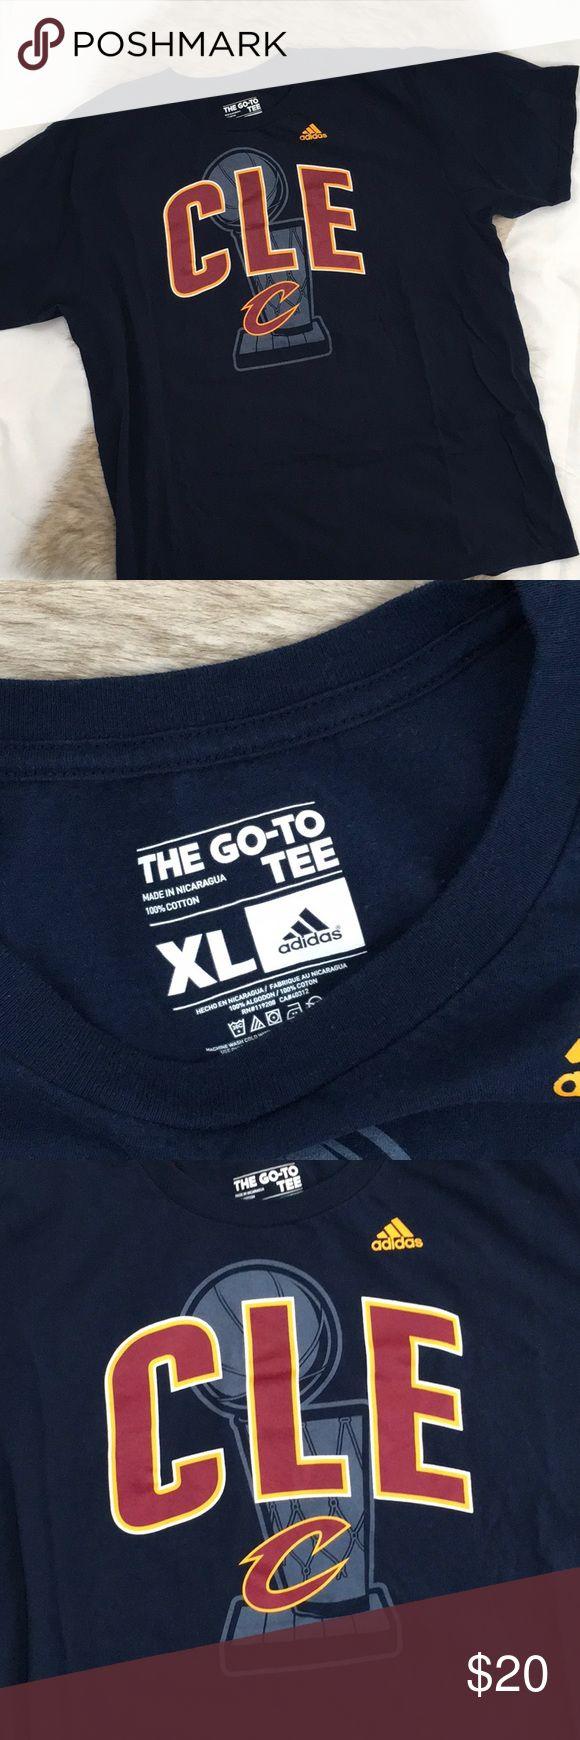 NWOT adidas Cleveland Cavaliers T-shirt Sz XL NWOT adidas Cleveland Cavaliers T-shirt Sz XL adidas Shirts Tees - Short Sleeve